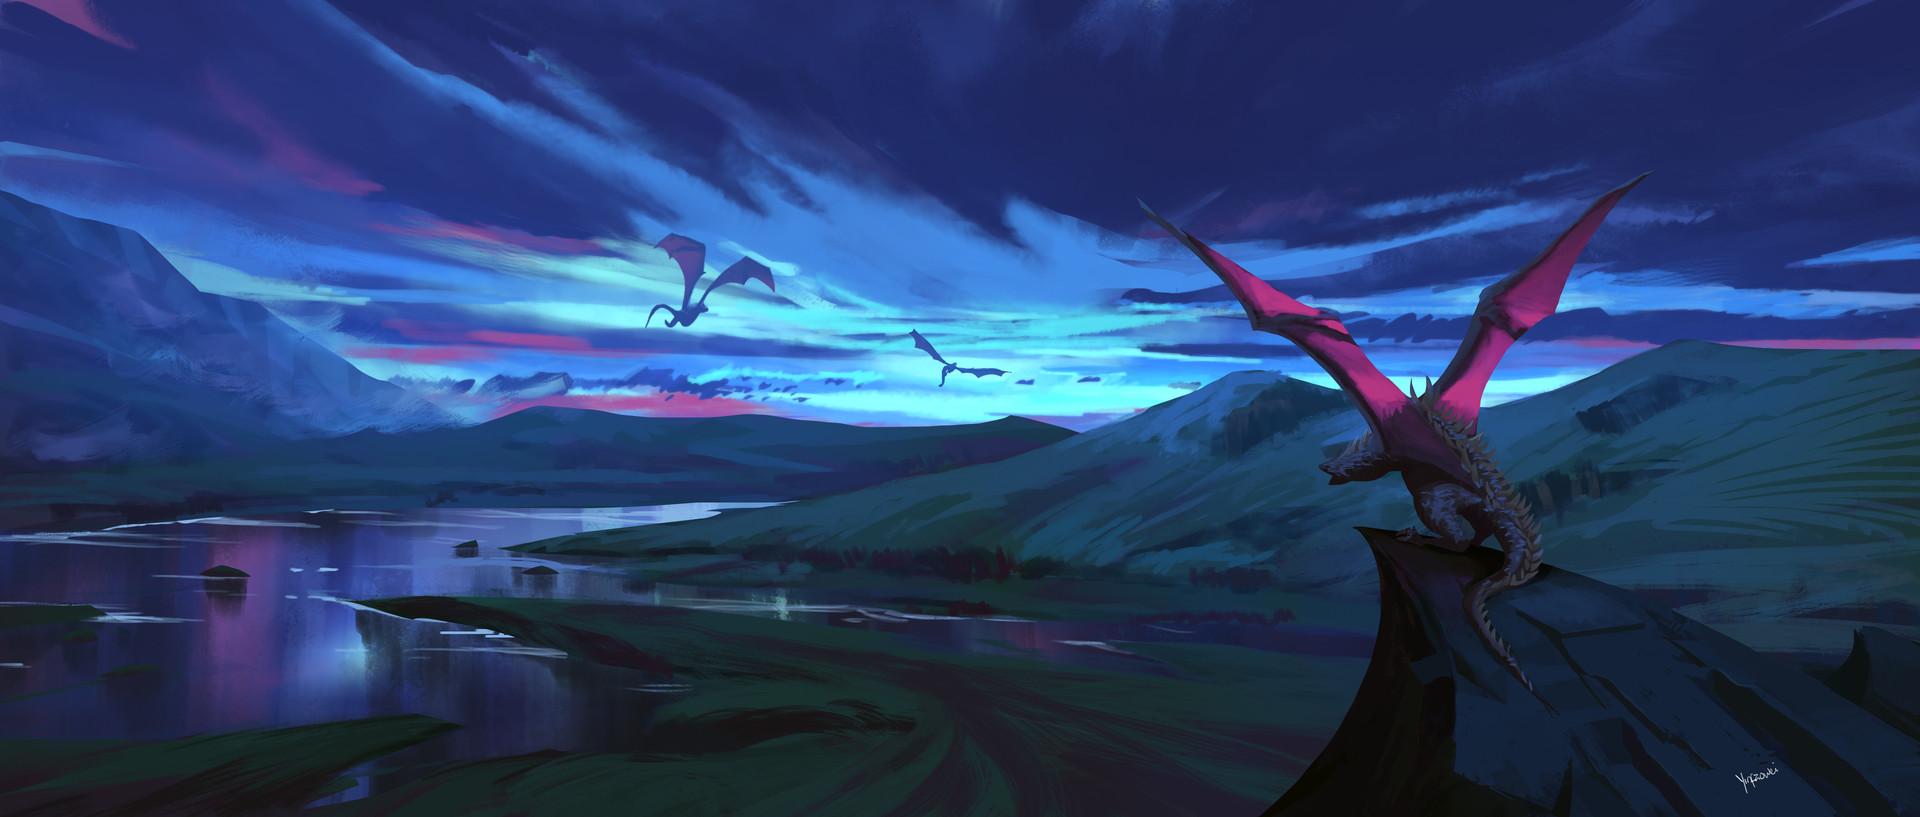 Harrison yinfaowei 18 8 17 dragons